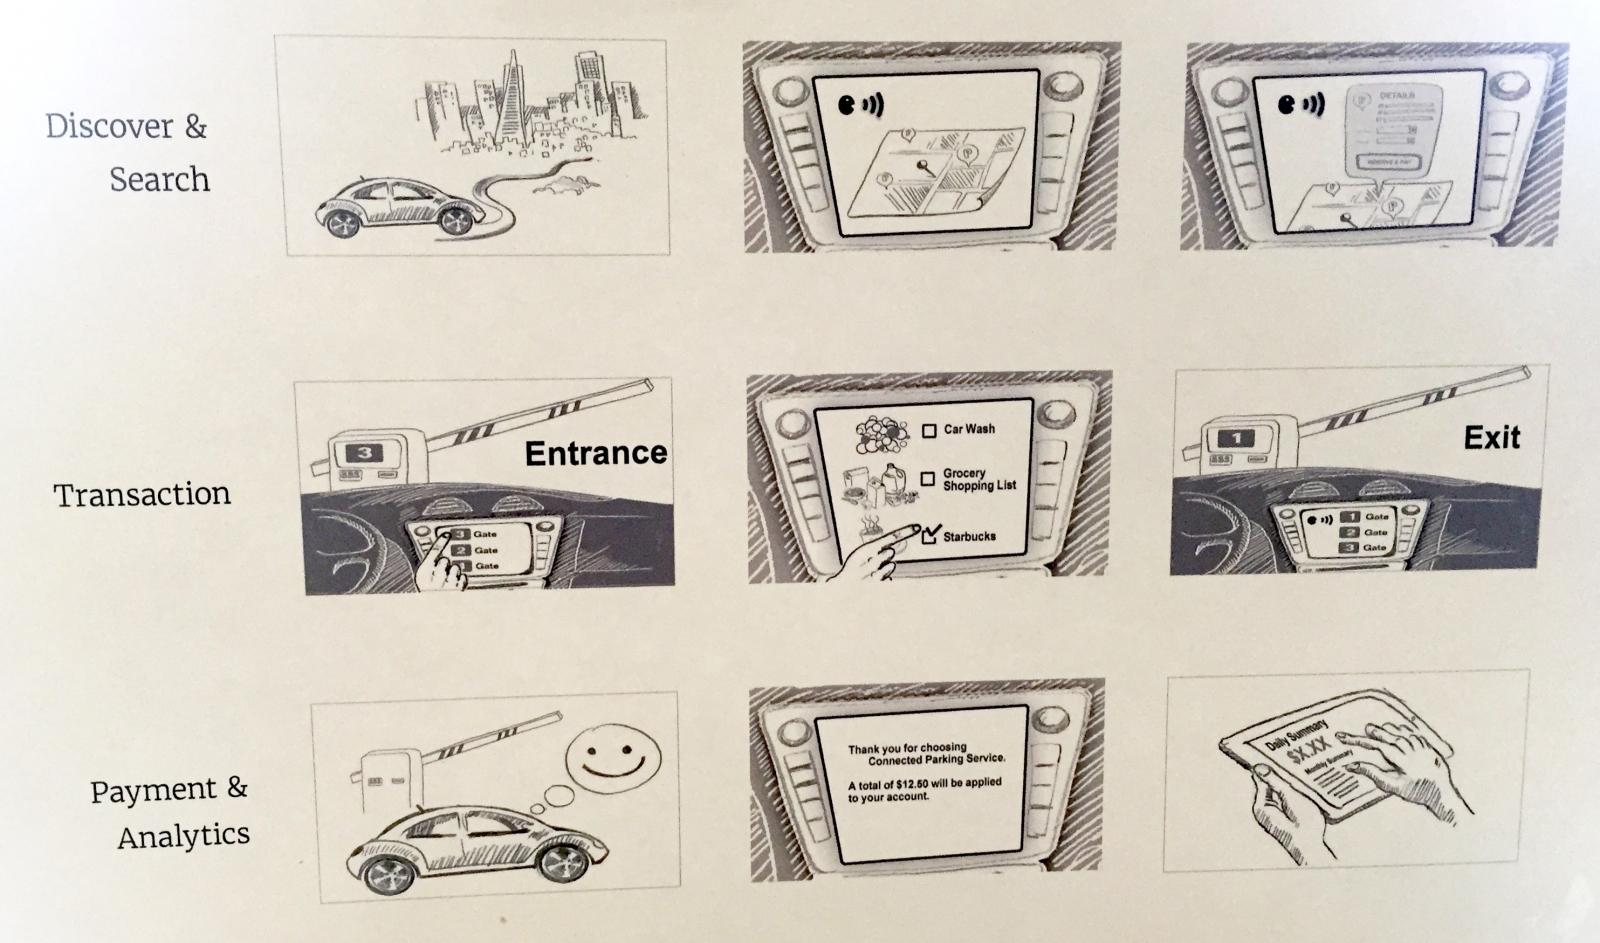 SAP connected car technologies